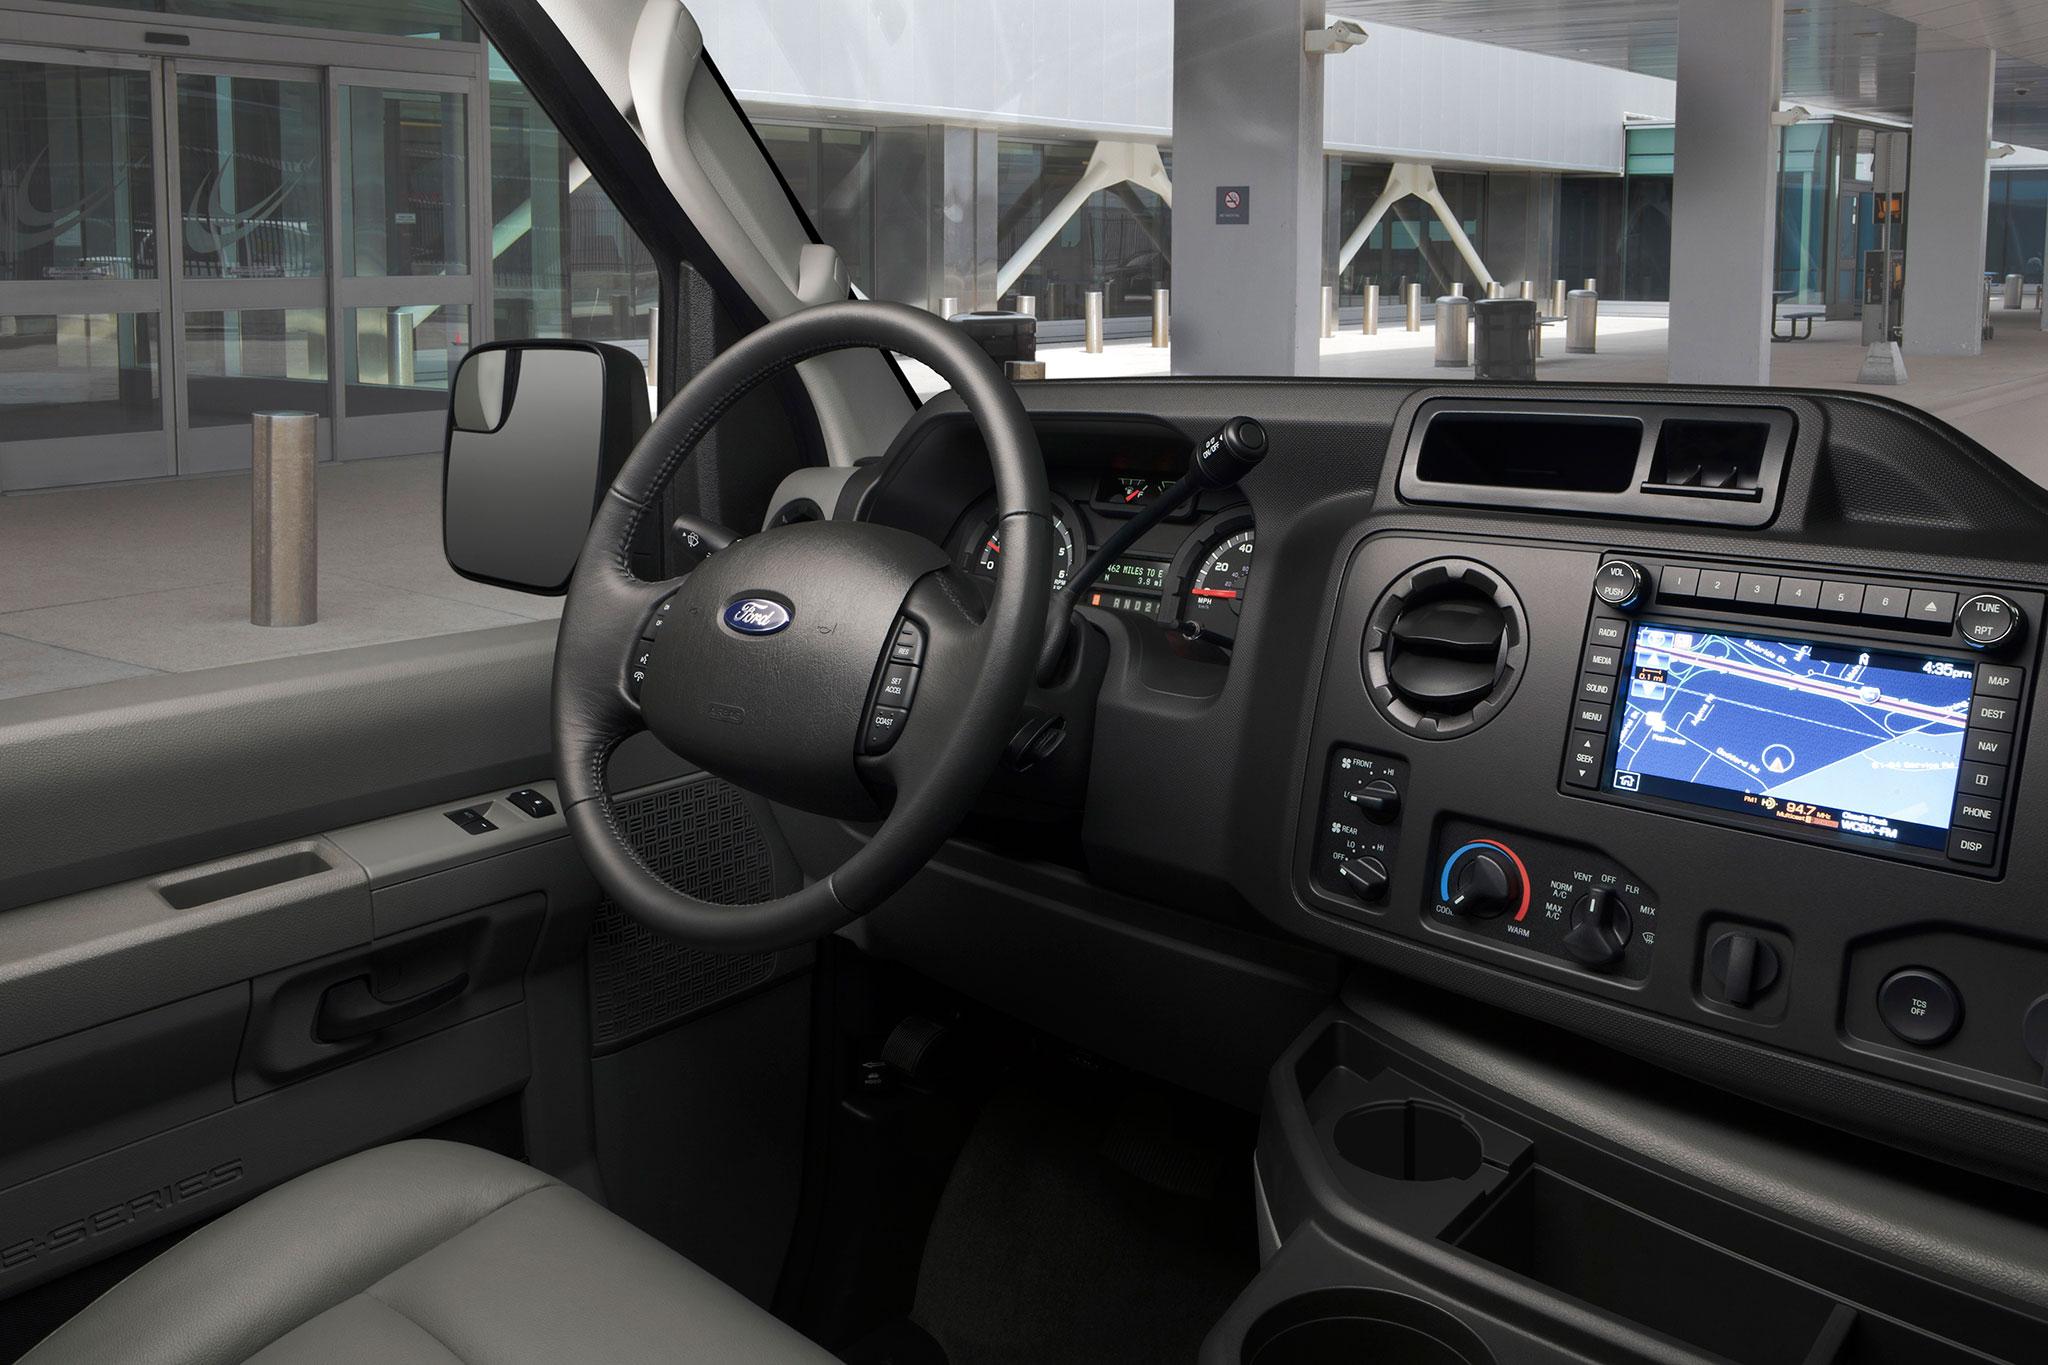 2014 Ford E Series. 28|123